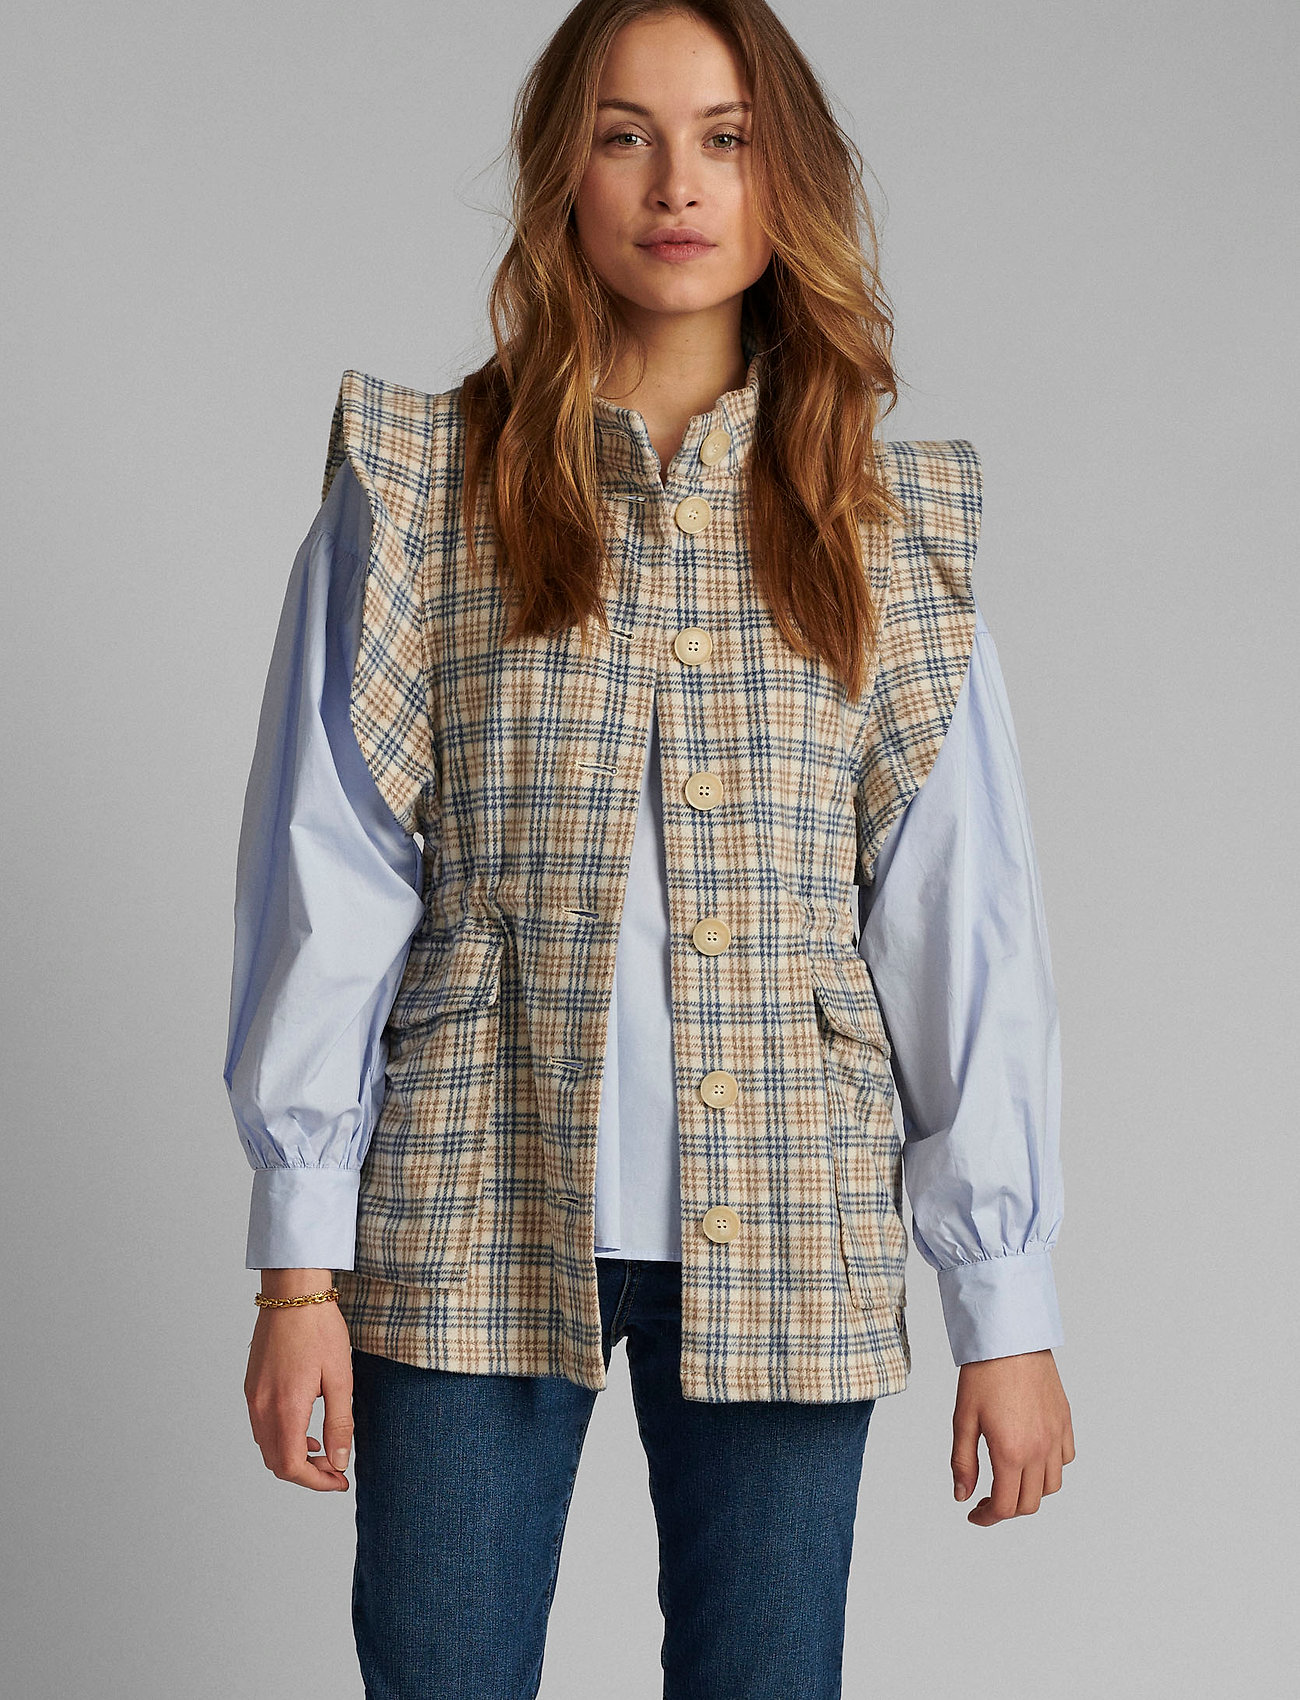 Nümph - NUALMA VEST - knitted vests - wedgewood - 0